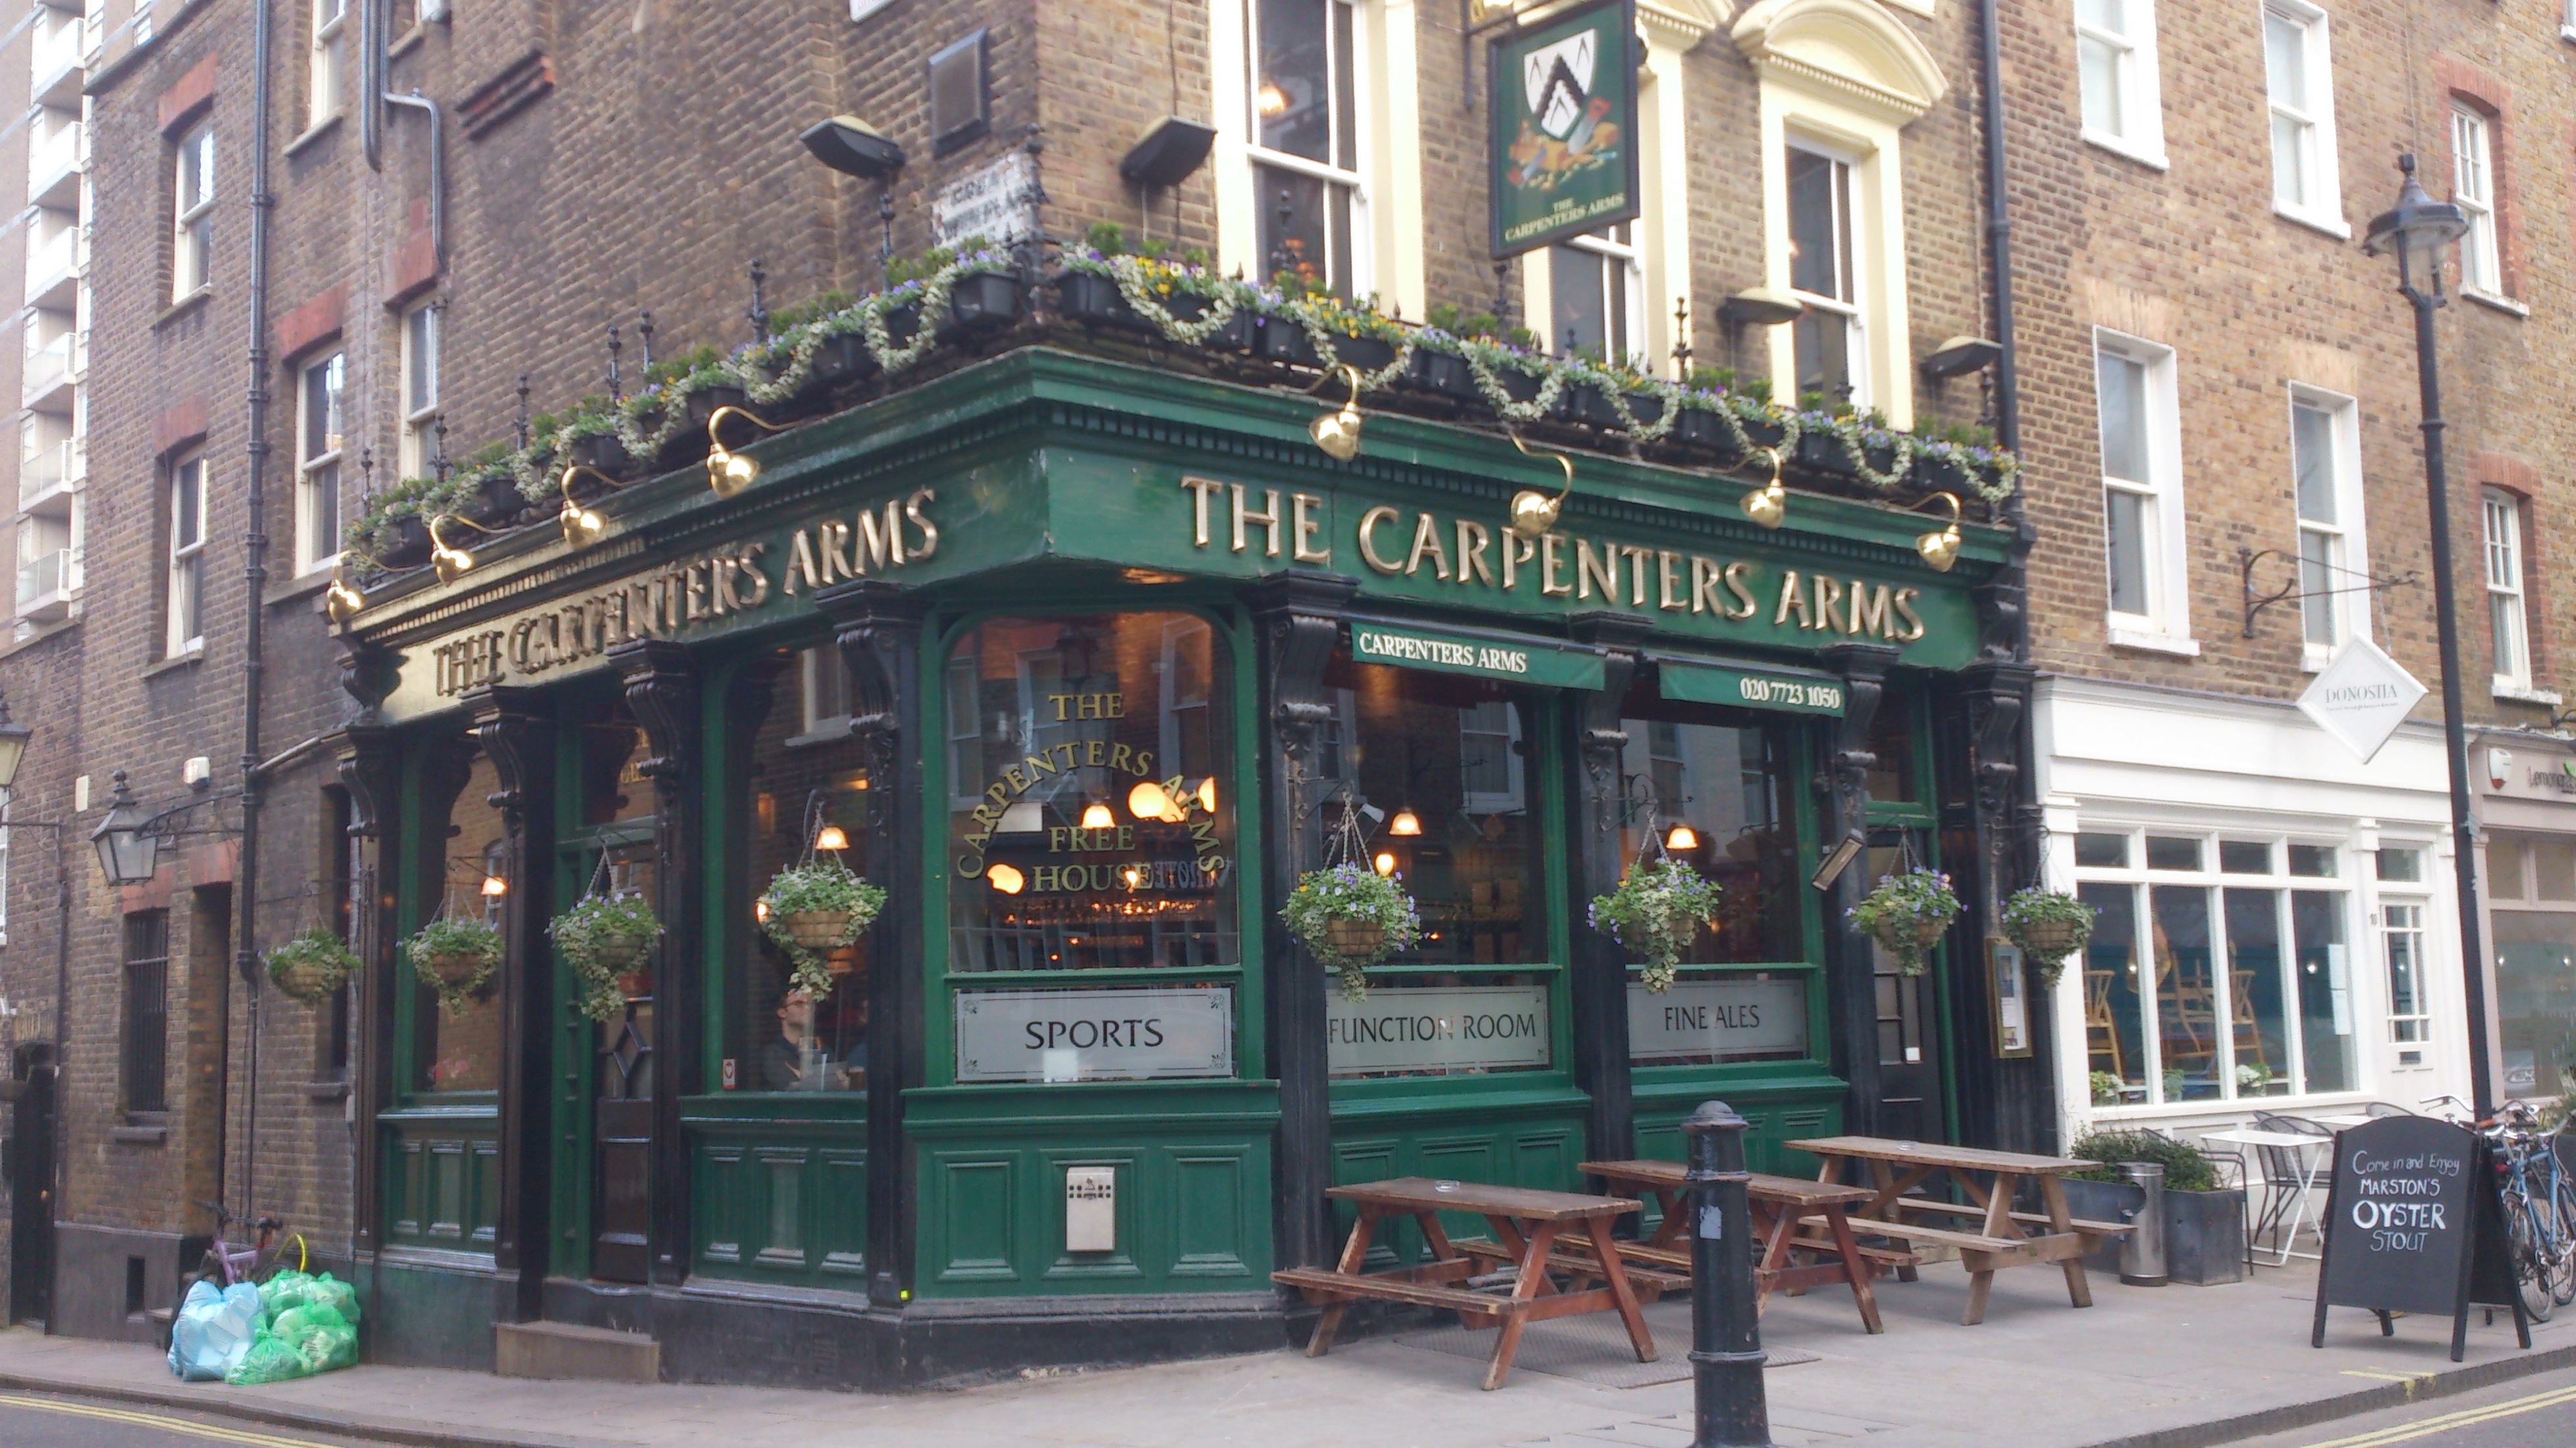 File The Carpenters Arms Seymour Place London Mar 2013